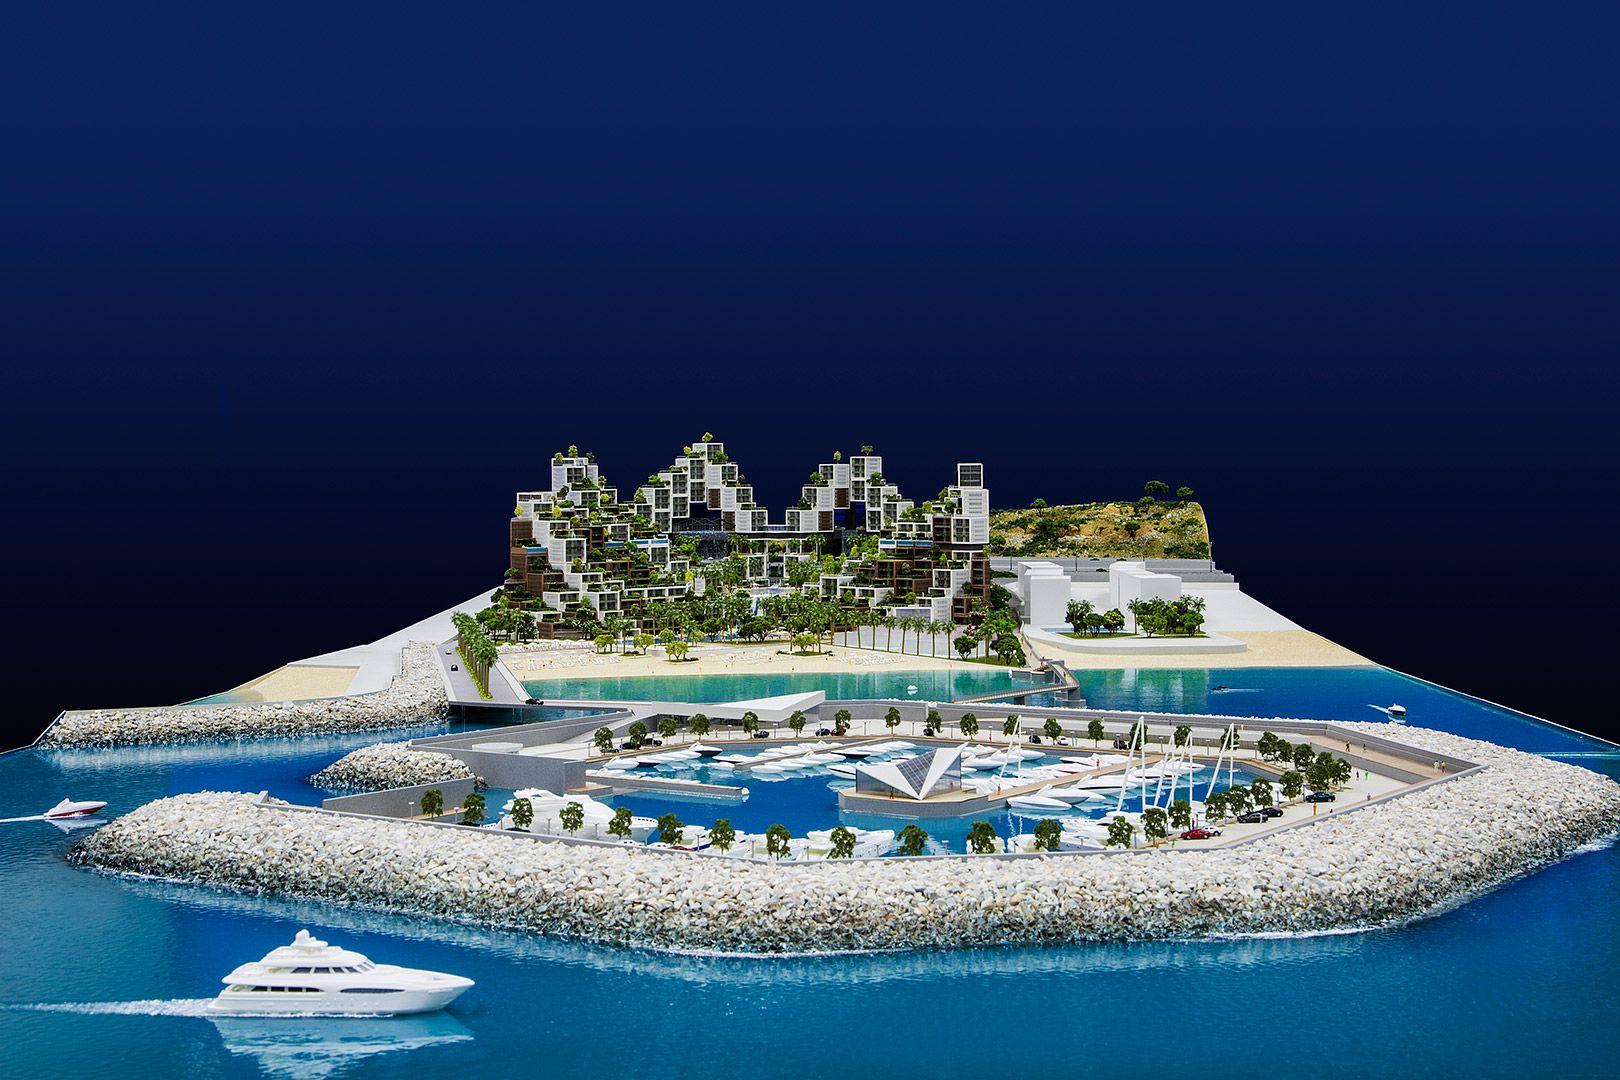 Beach wedding spots  Project  Galateia Client  SAYFCO Location  Lebanon  Scale